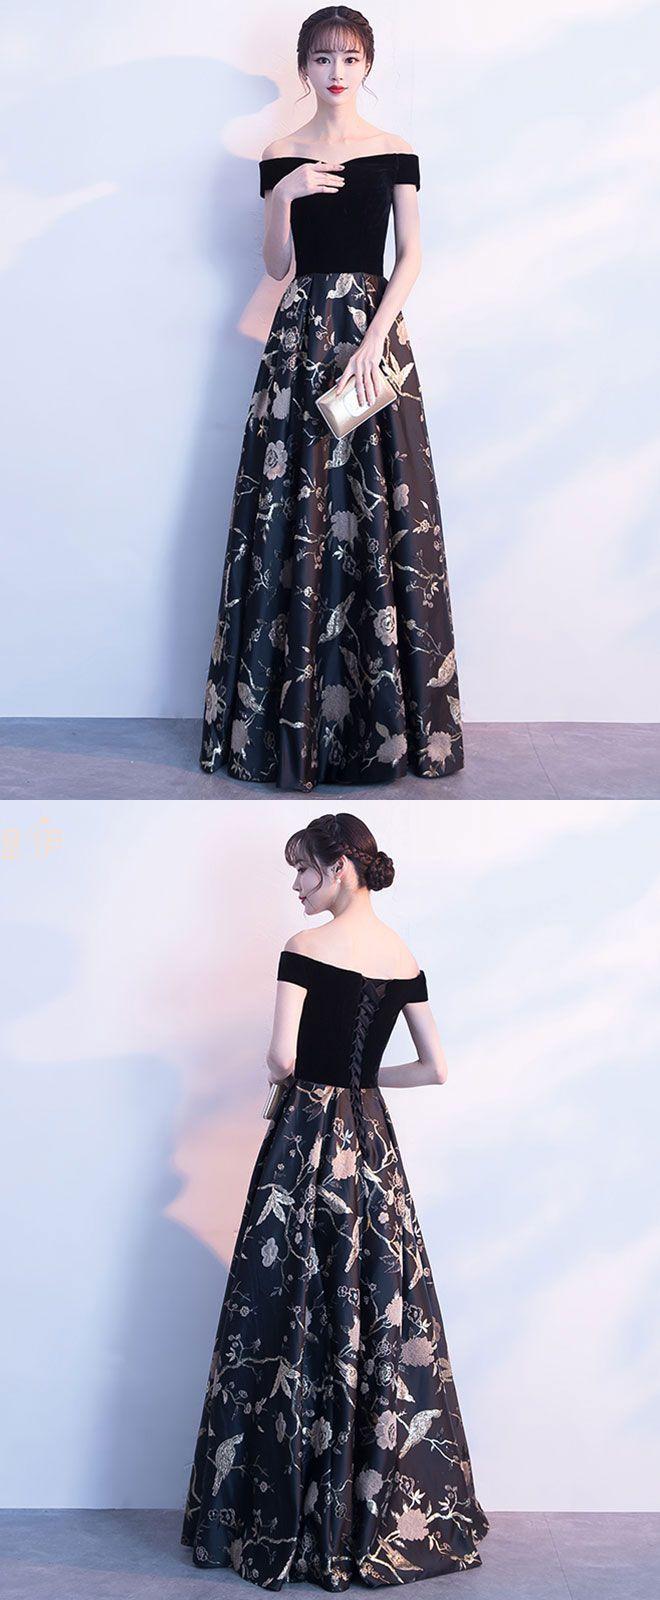 6bb67e34b7 Black off shoulder floral pattern long prom dress, evening dress in ...